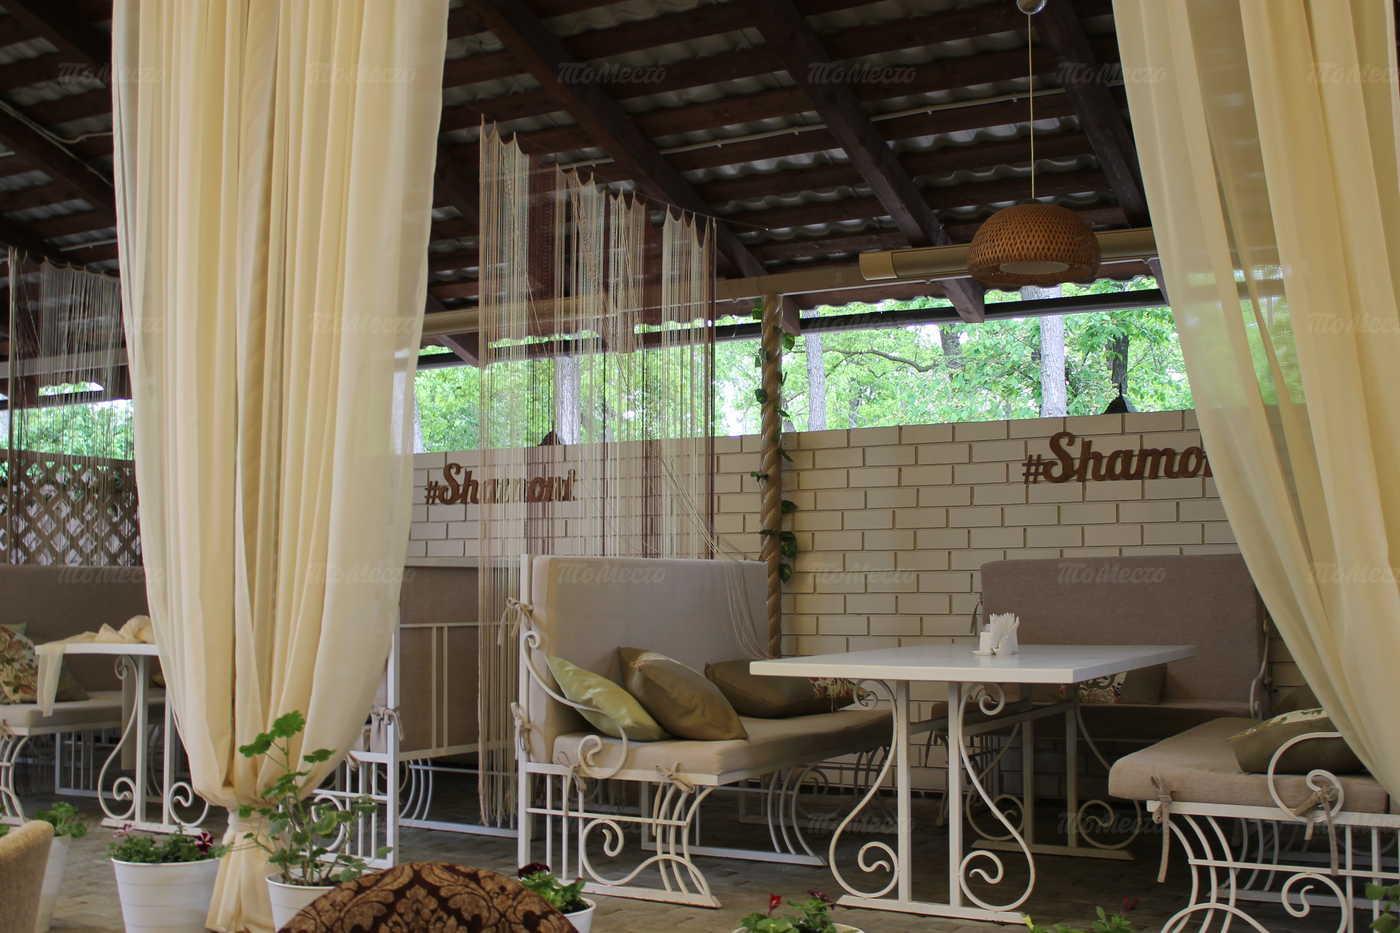 Меню ресторана Shamoni (бывш. Соверен клуб) в Лесопарковом